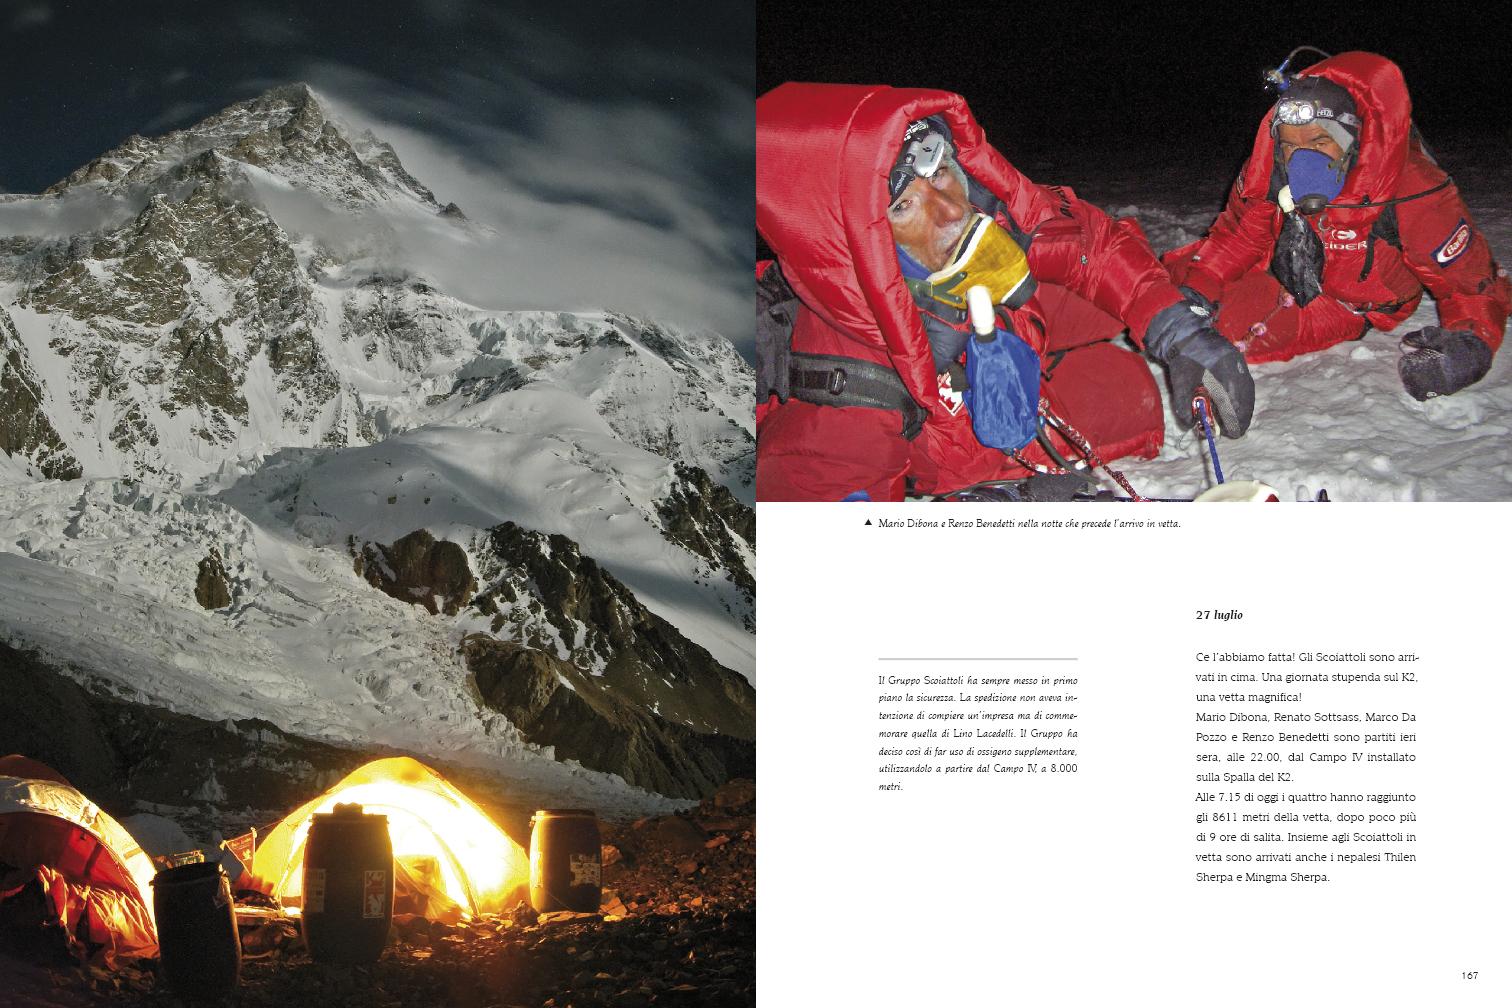 K2 EXPEDITION 1954-2004 Giuseppe Ghedina Fotografo - 085.jpg